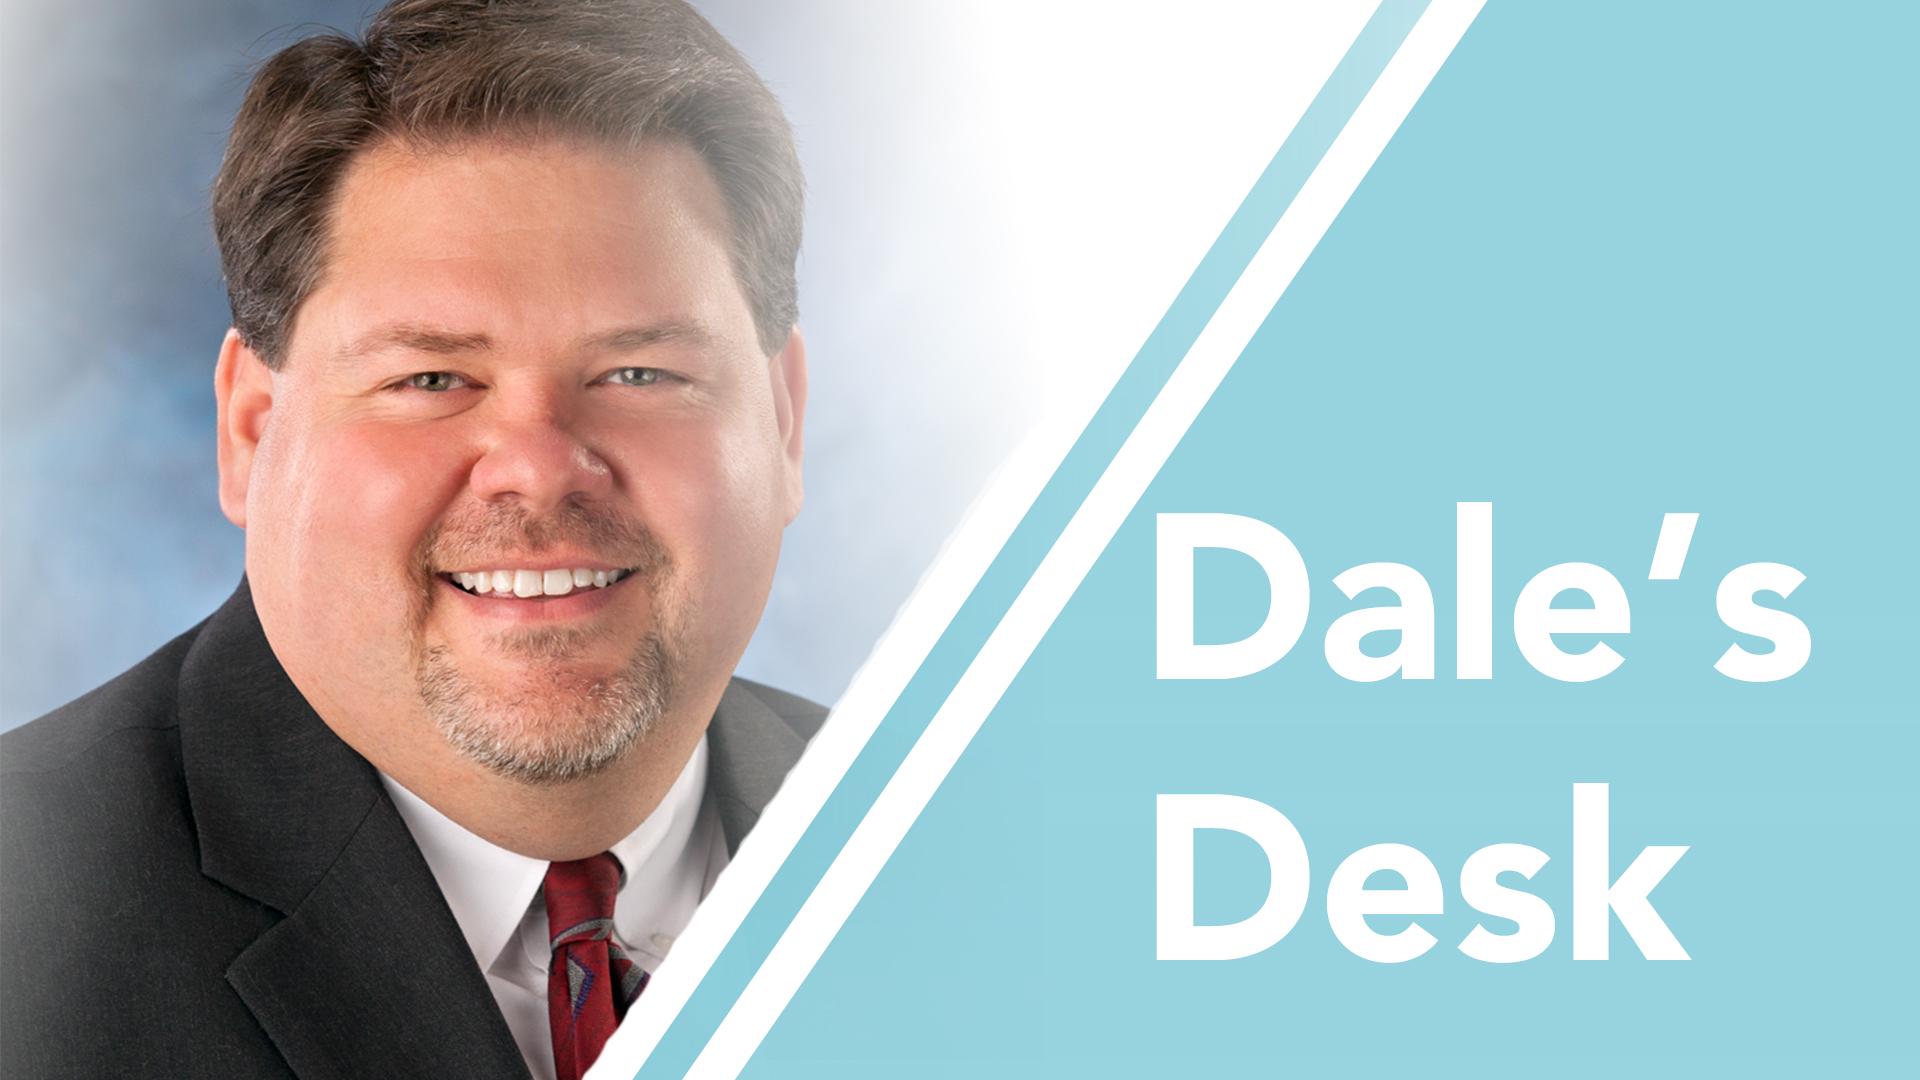 Dales Desk